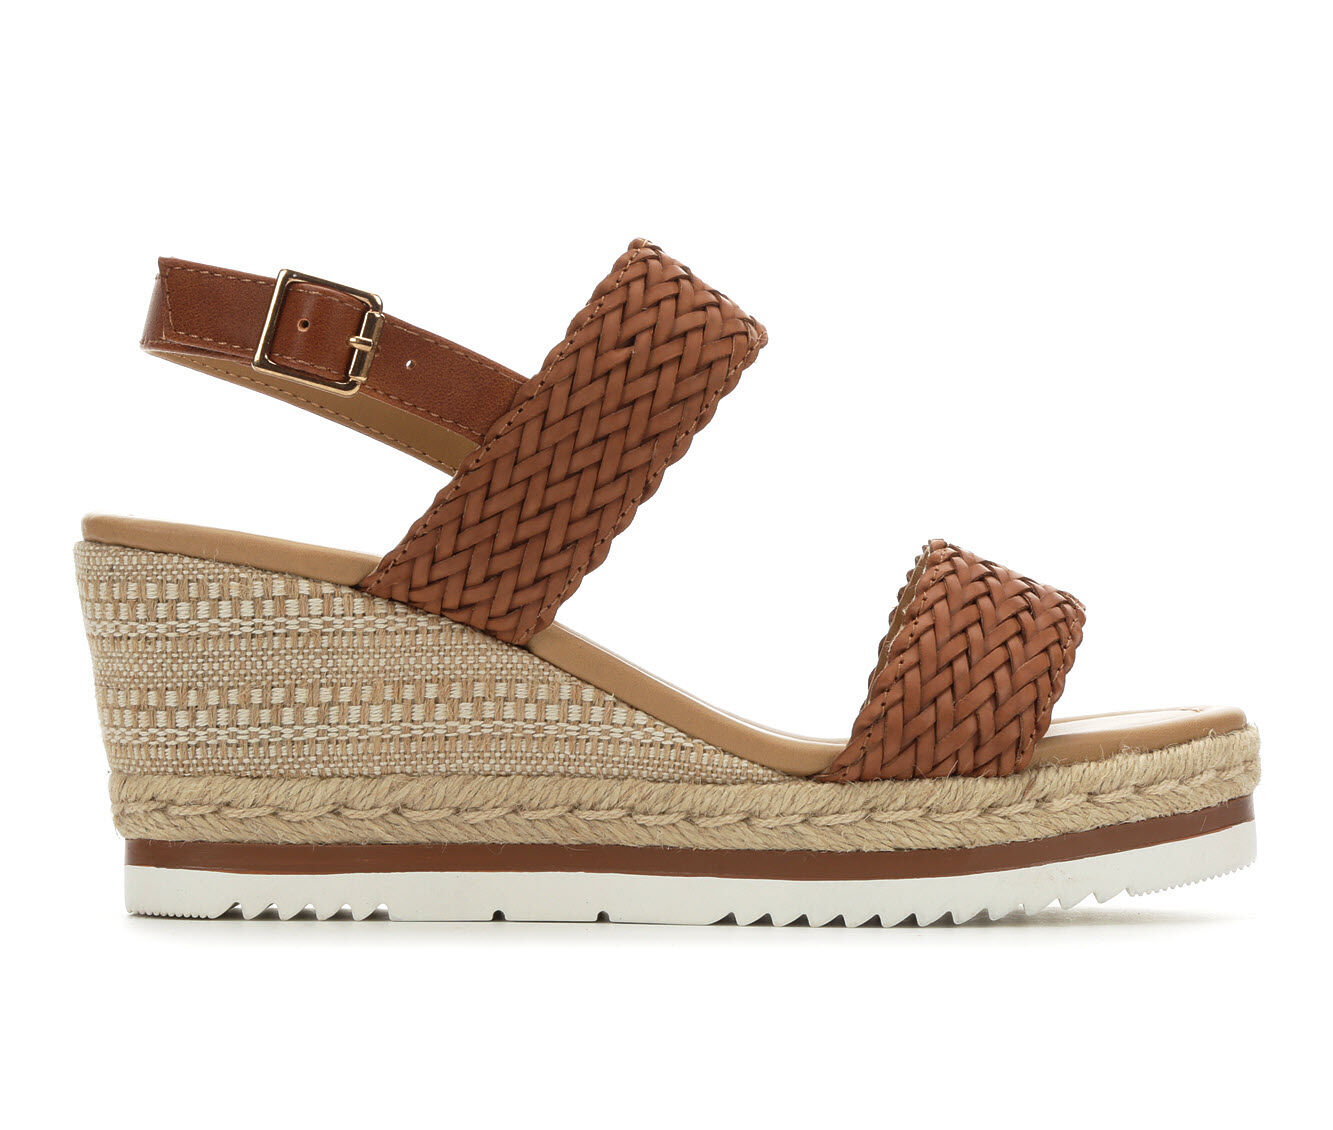 uk shoes_kd2660